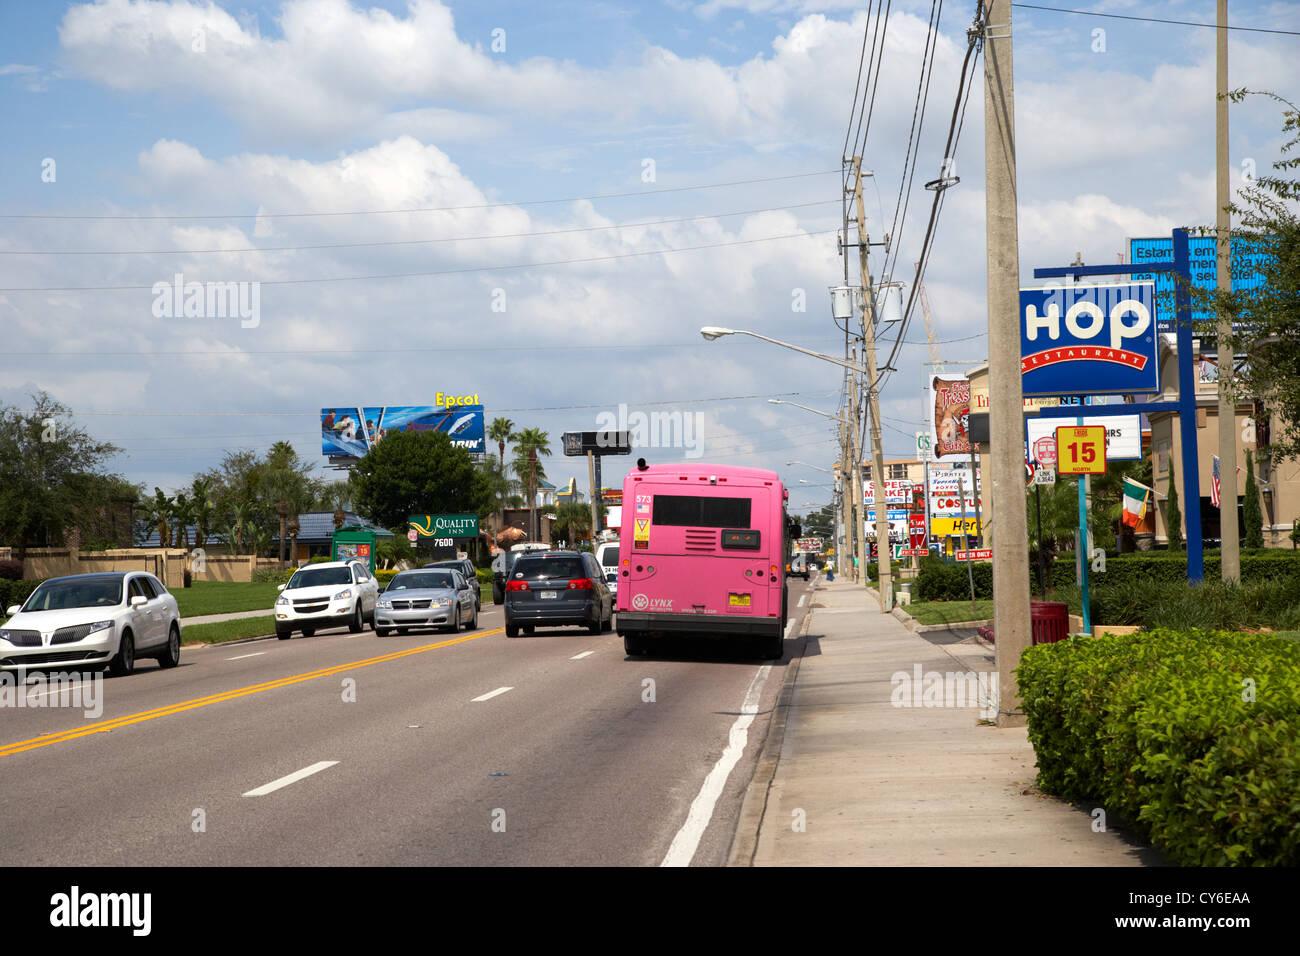 upper international drive orlando florida usa - Stock Image